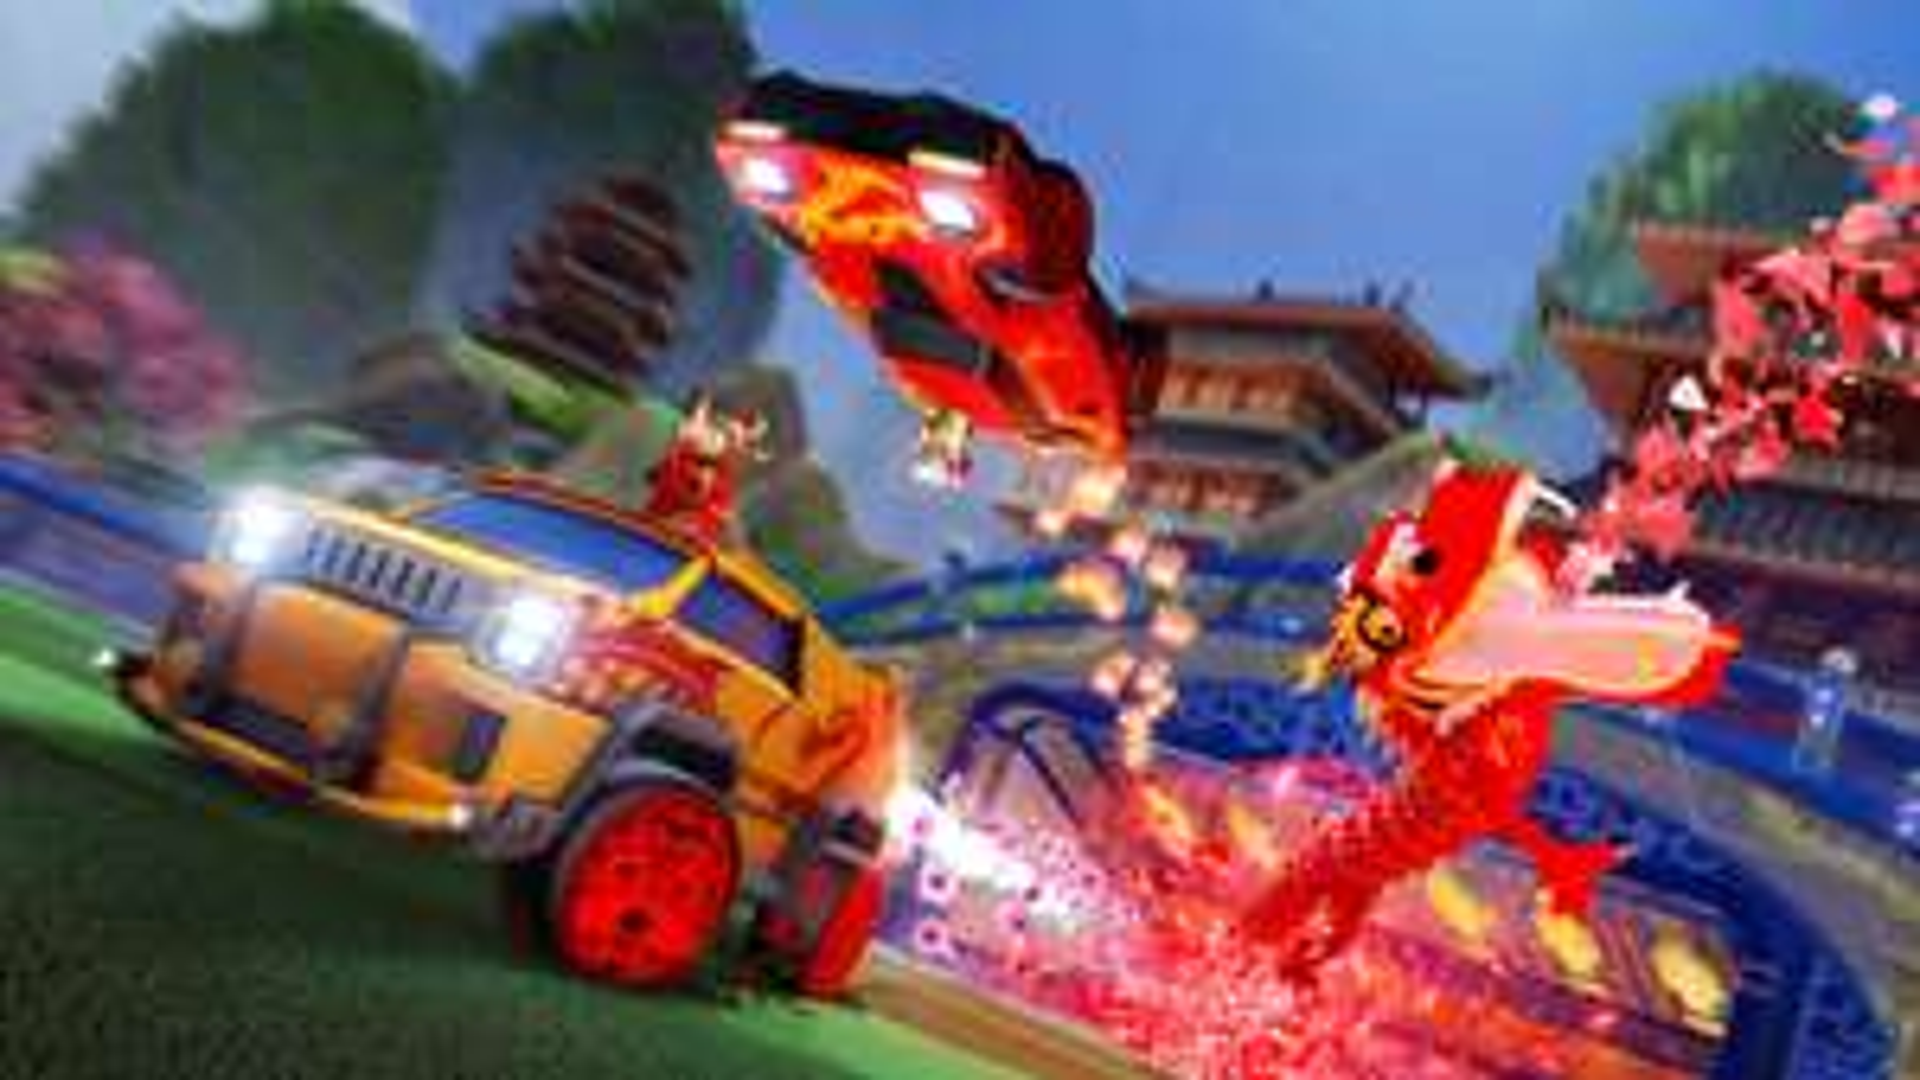 Rocket League - kostenloser Avatarrahmen 'Shen' zum Lucky Lantern Event (freebie)